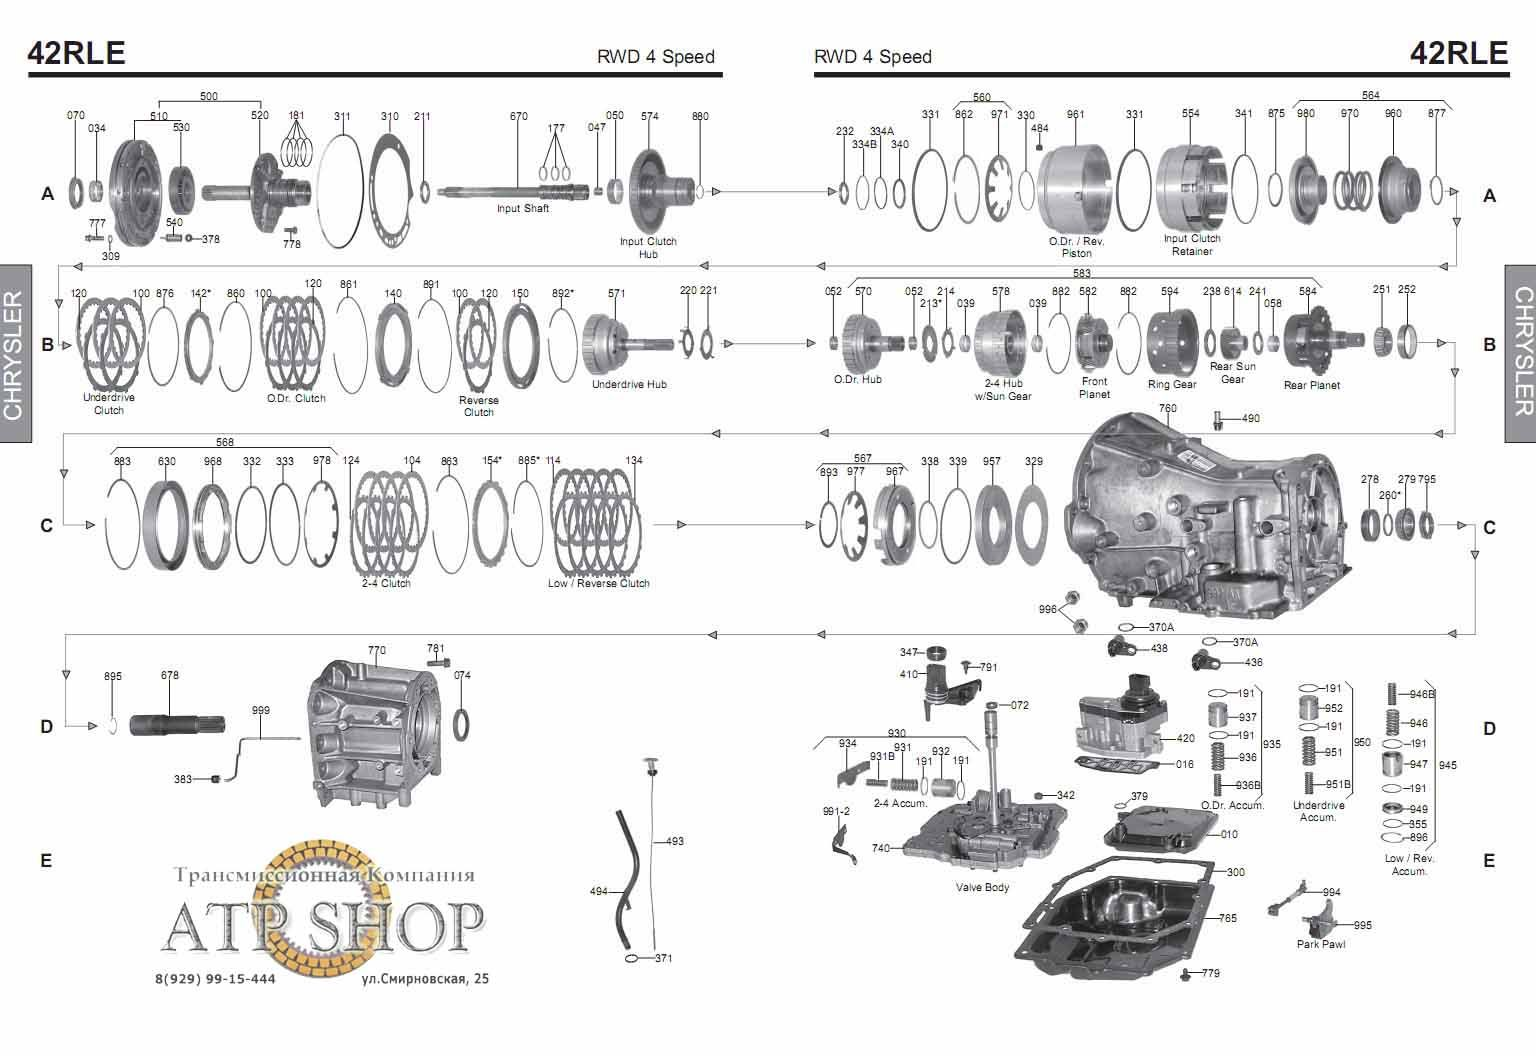 Caja Automática Jeep: CAJA AUTOMÁTICA JEP WRANGLER 03-08